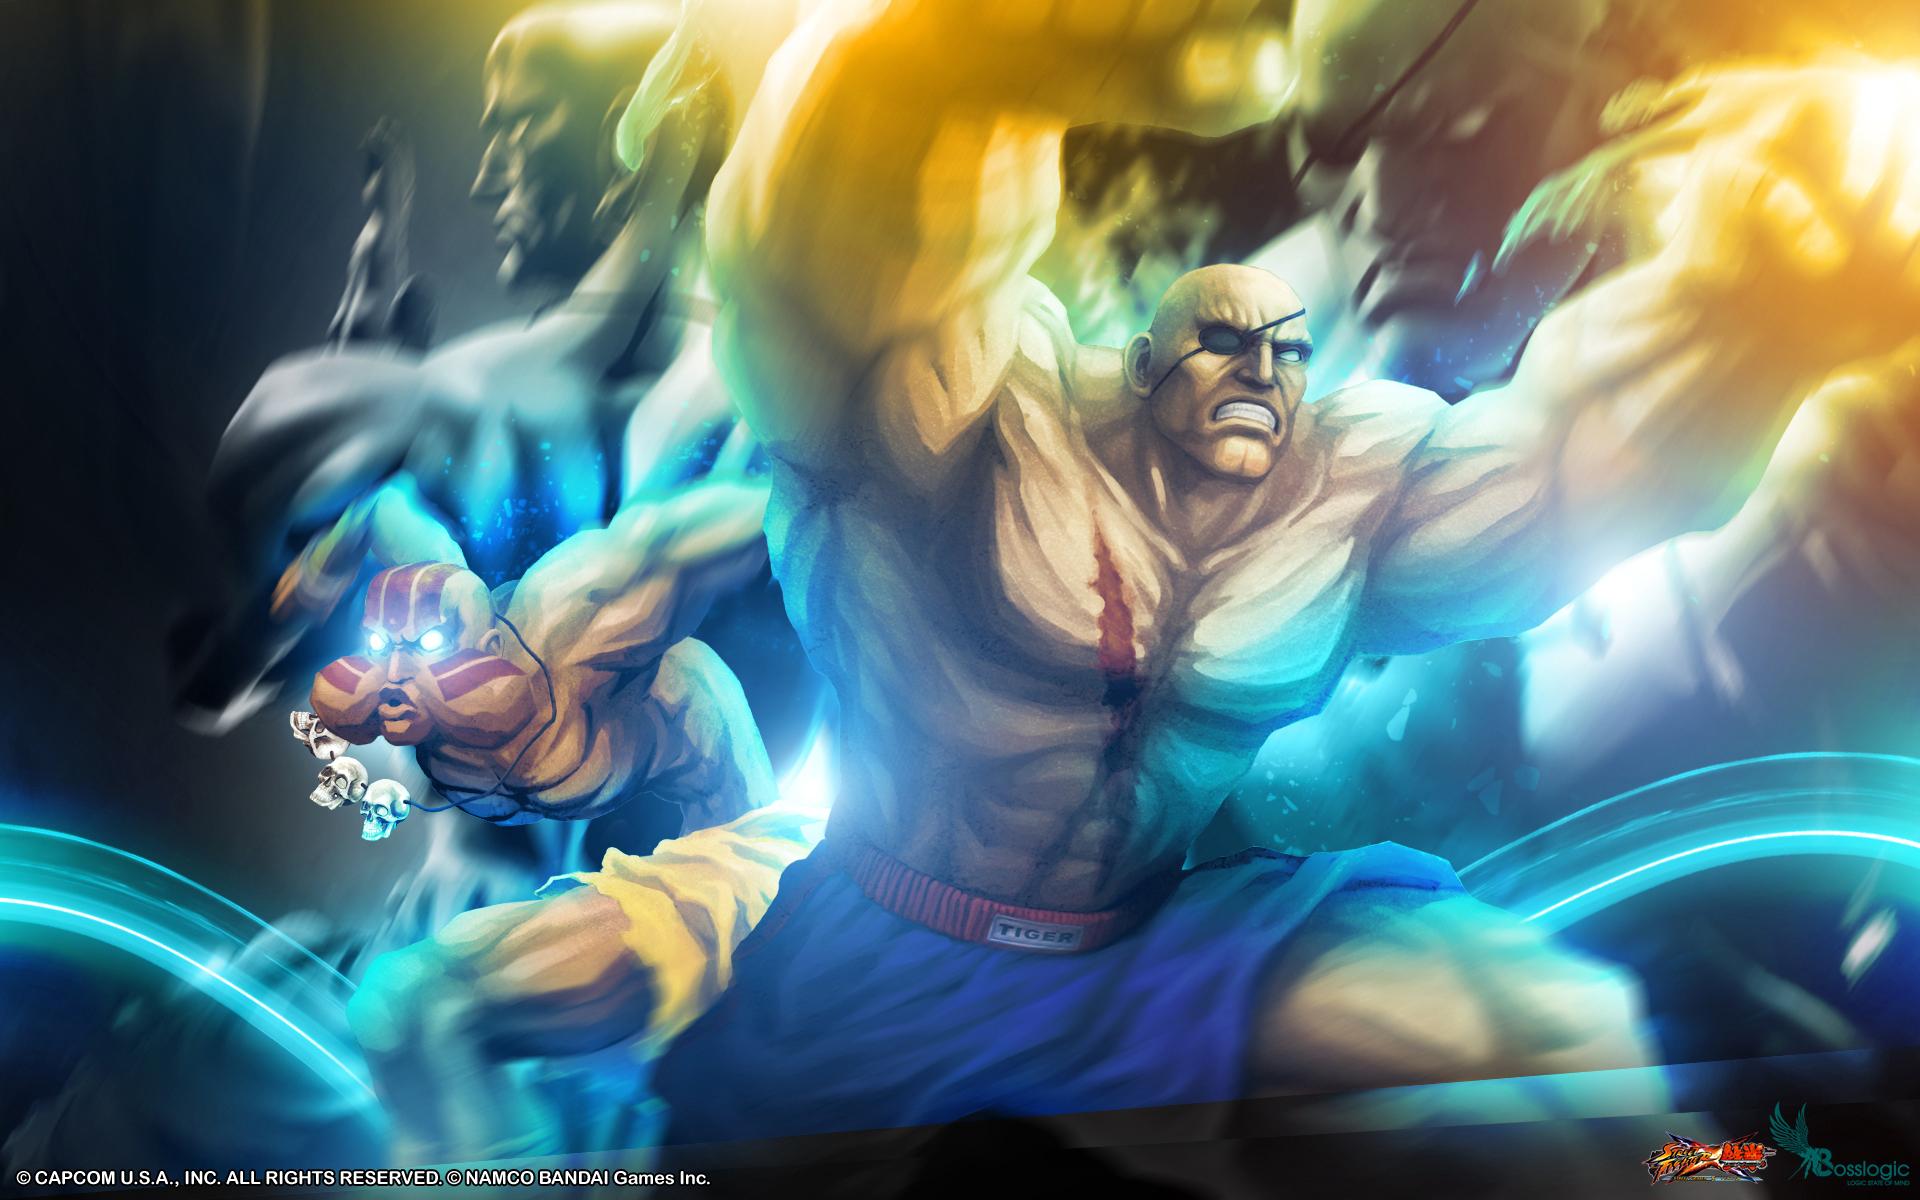 Street Fighter X Tekken Boss Logic Wallpaper 10